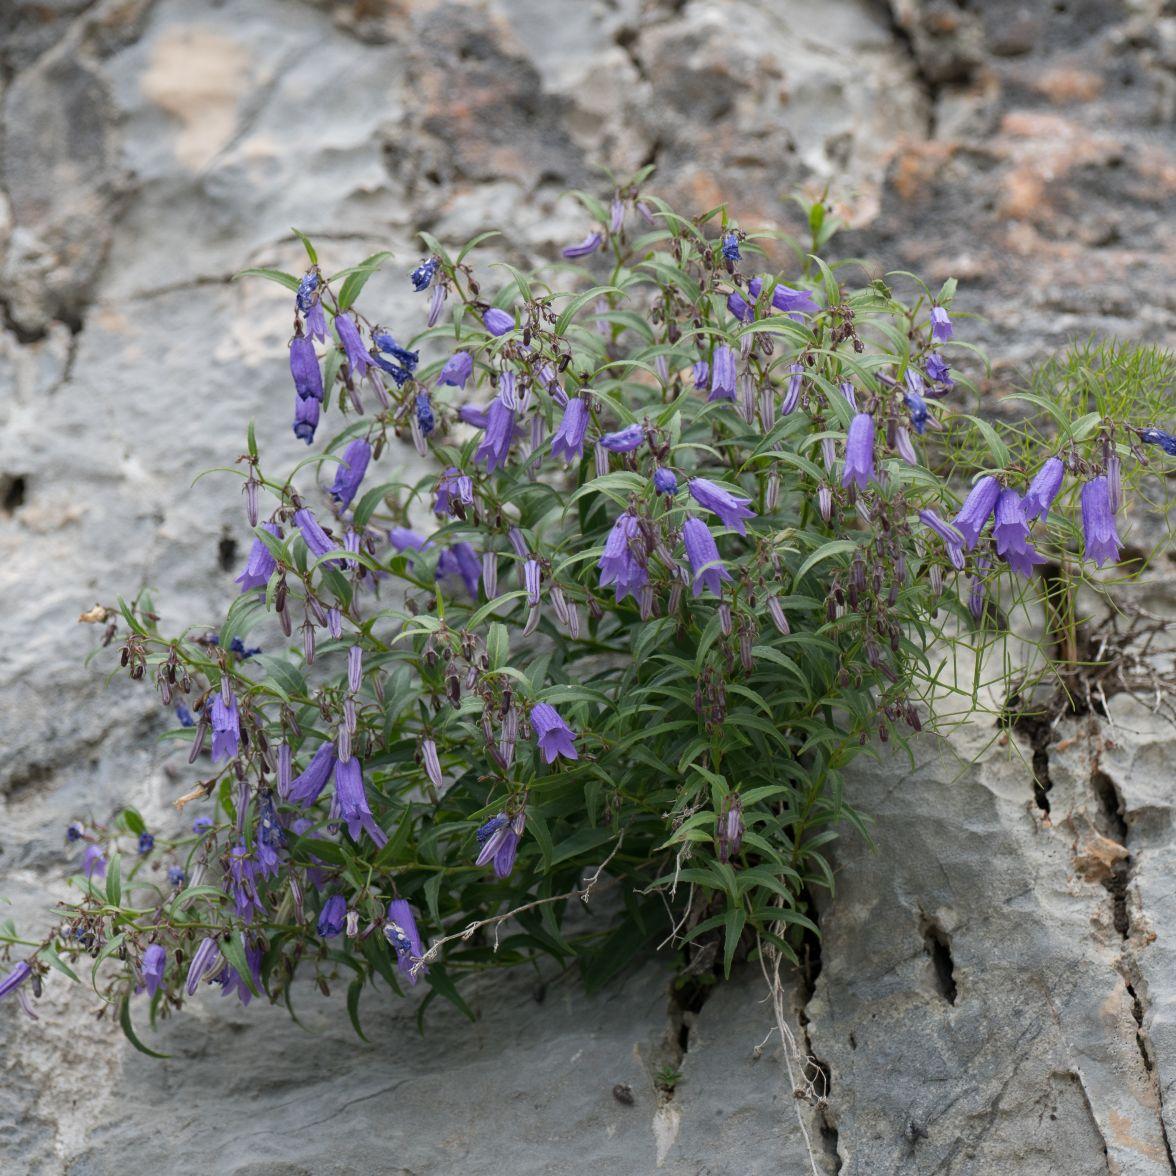 Bellflower species on cliff; possibly Campanula tommassiniana